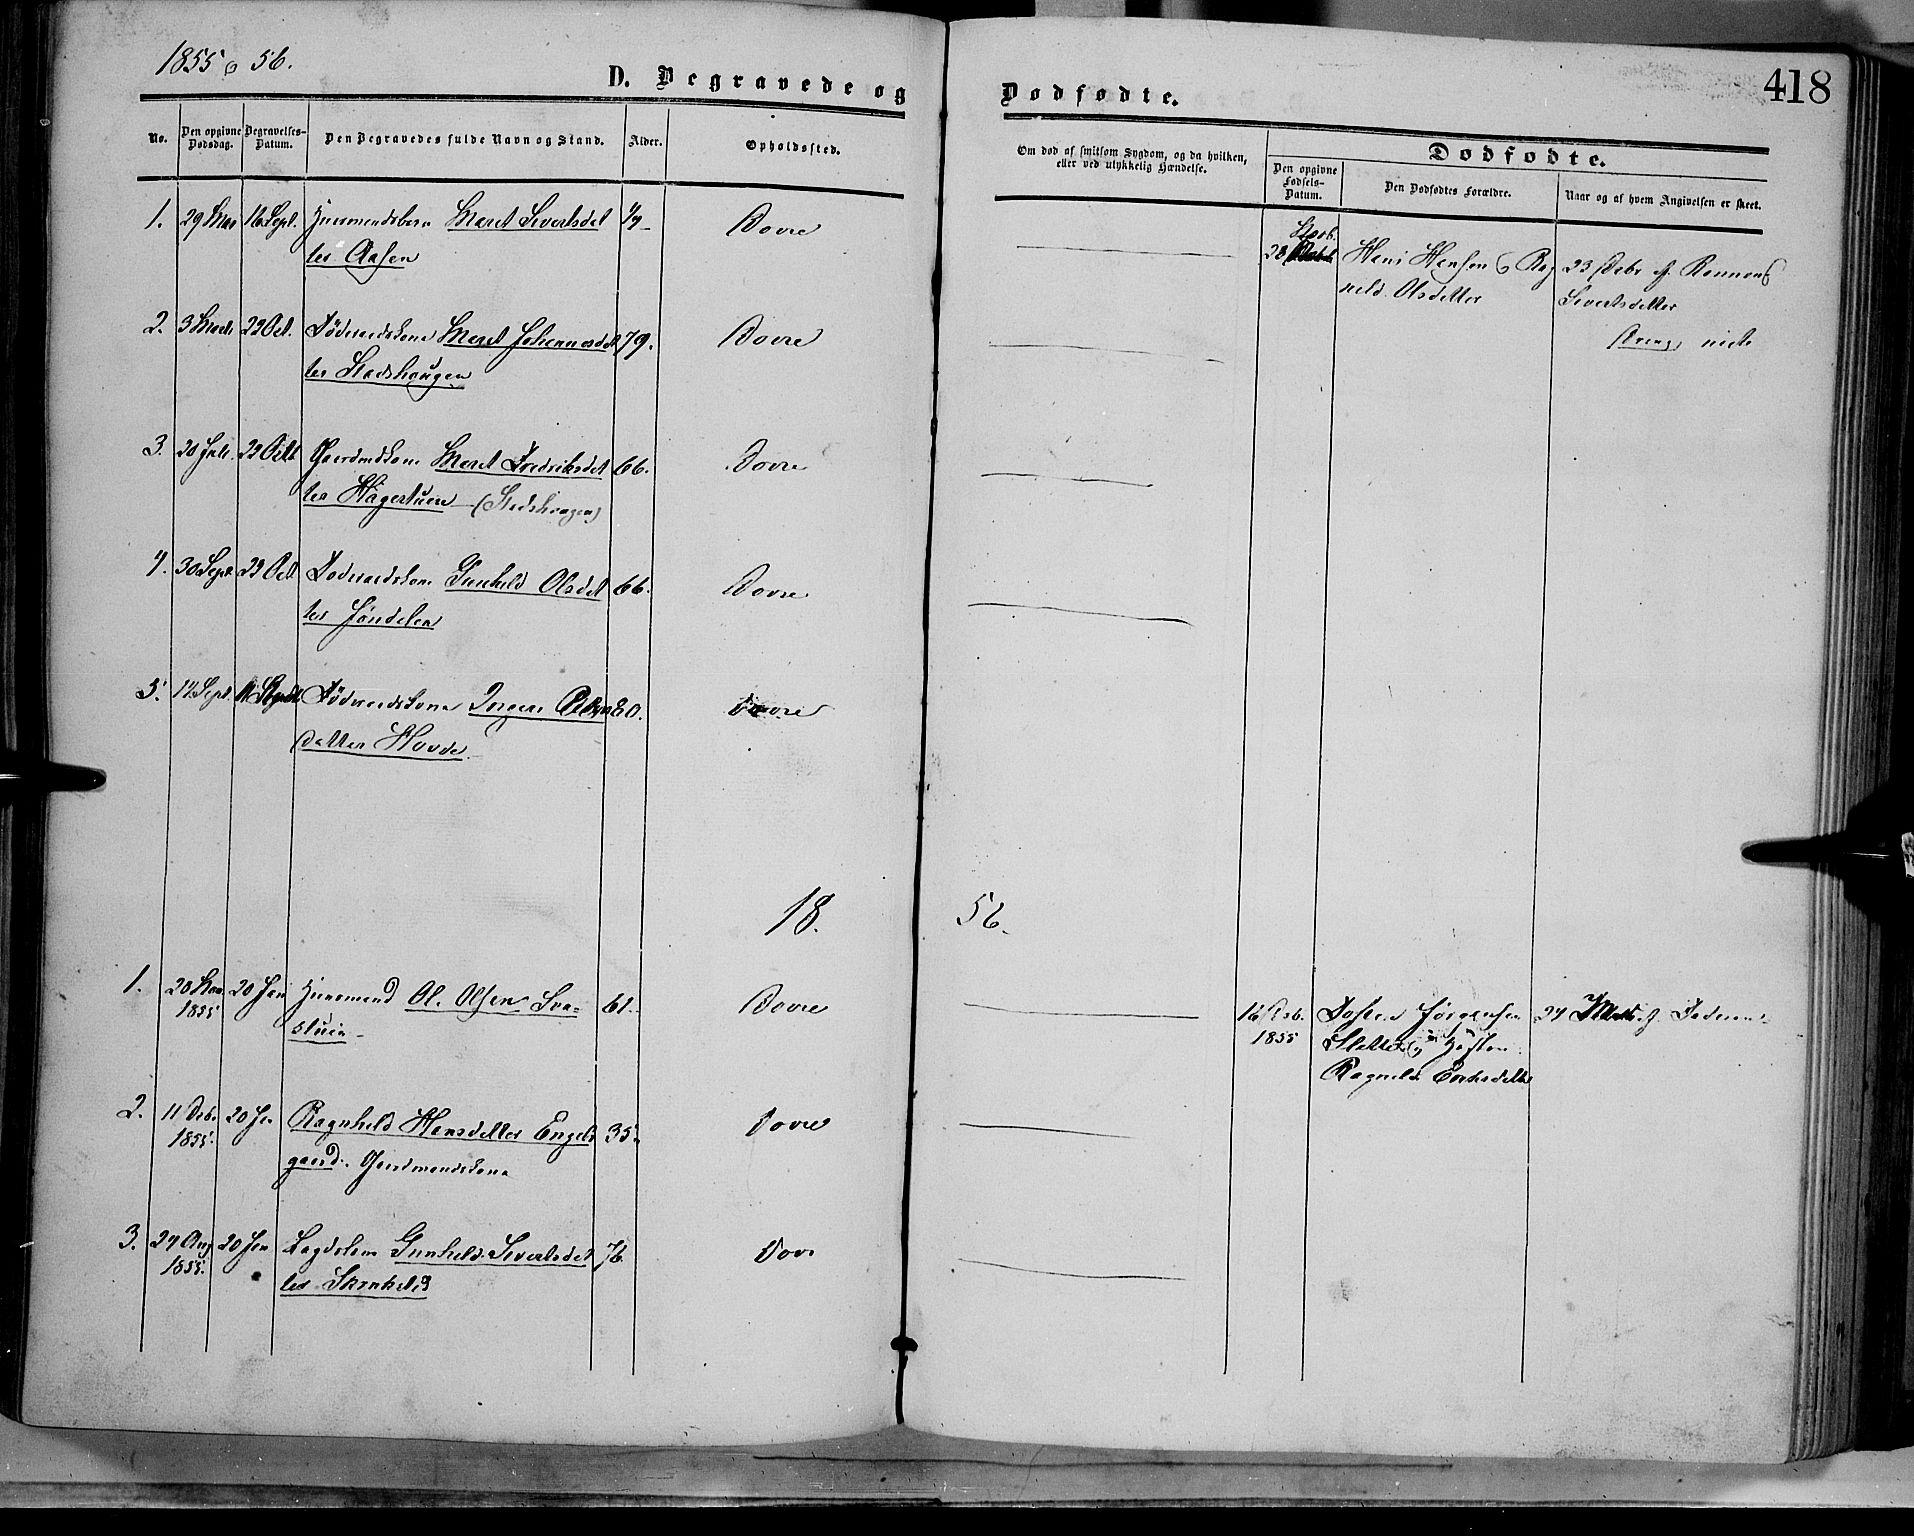 SAH, Dovre prestekontor, Parish register (official) no. 1, 1854-1878, p. 418